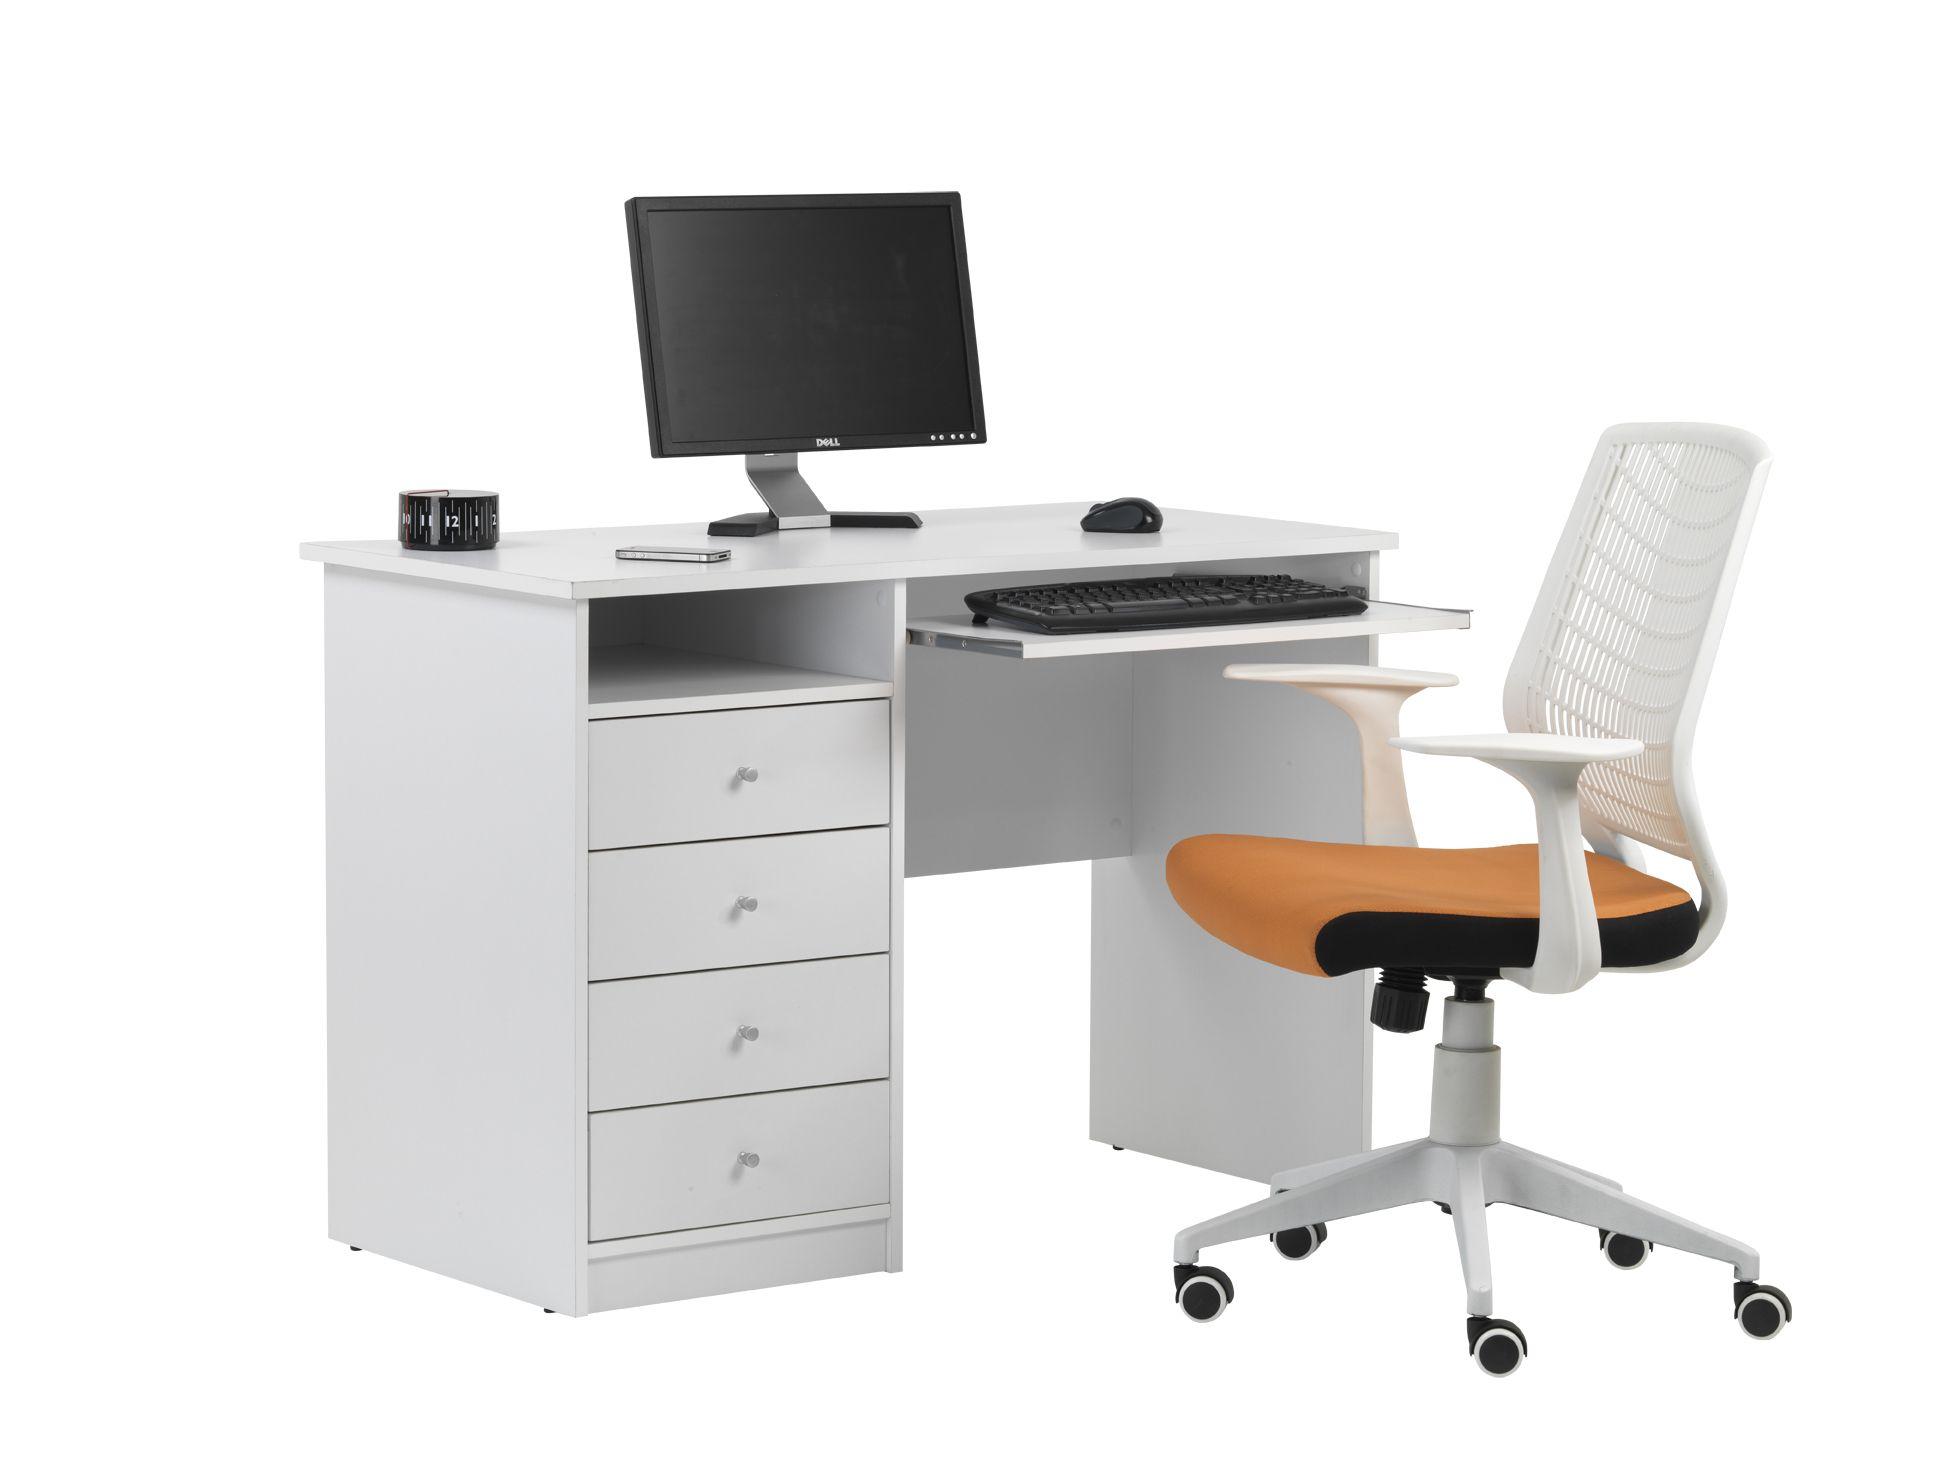 White Student Desk Dimensions Width 110cm N W 34 8kg Depth